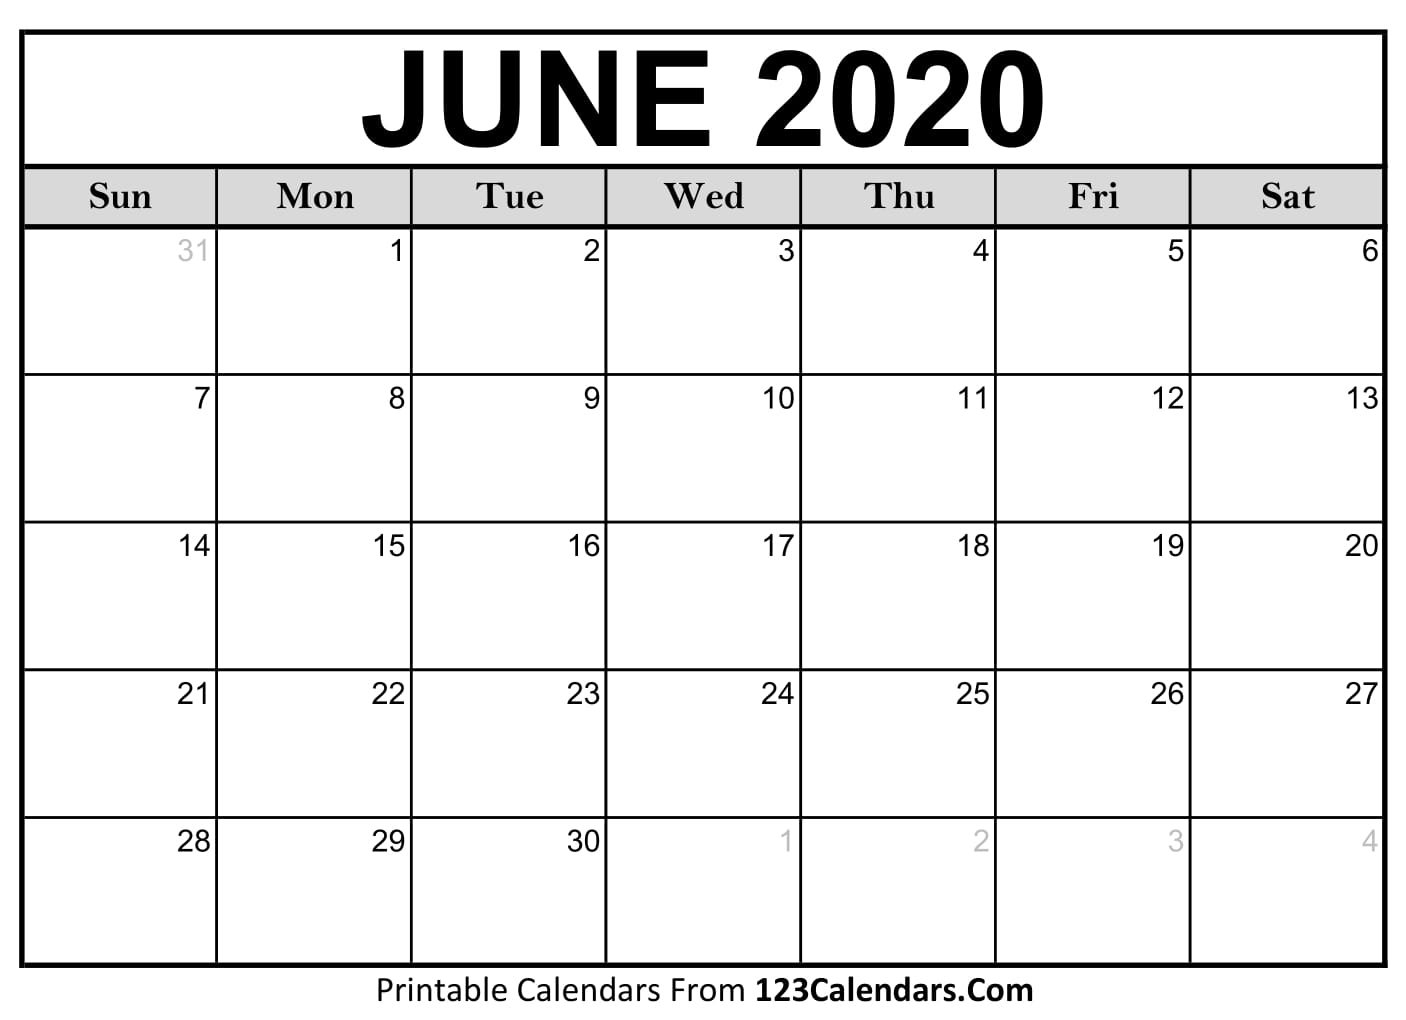 Free June 2020 Calendar   123Calendars Printable Rip Off Day Calendar